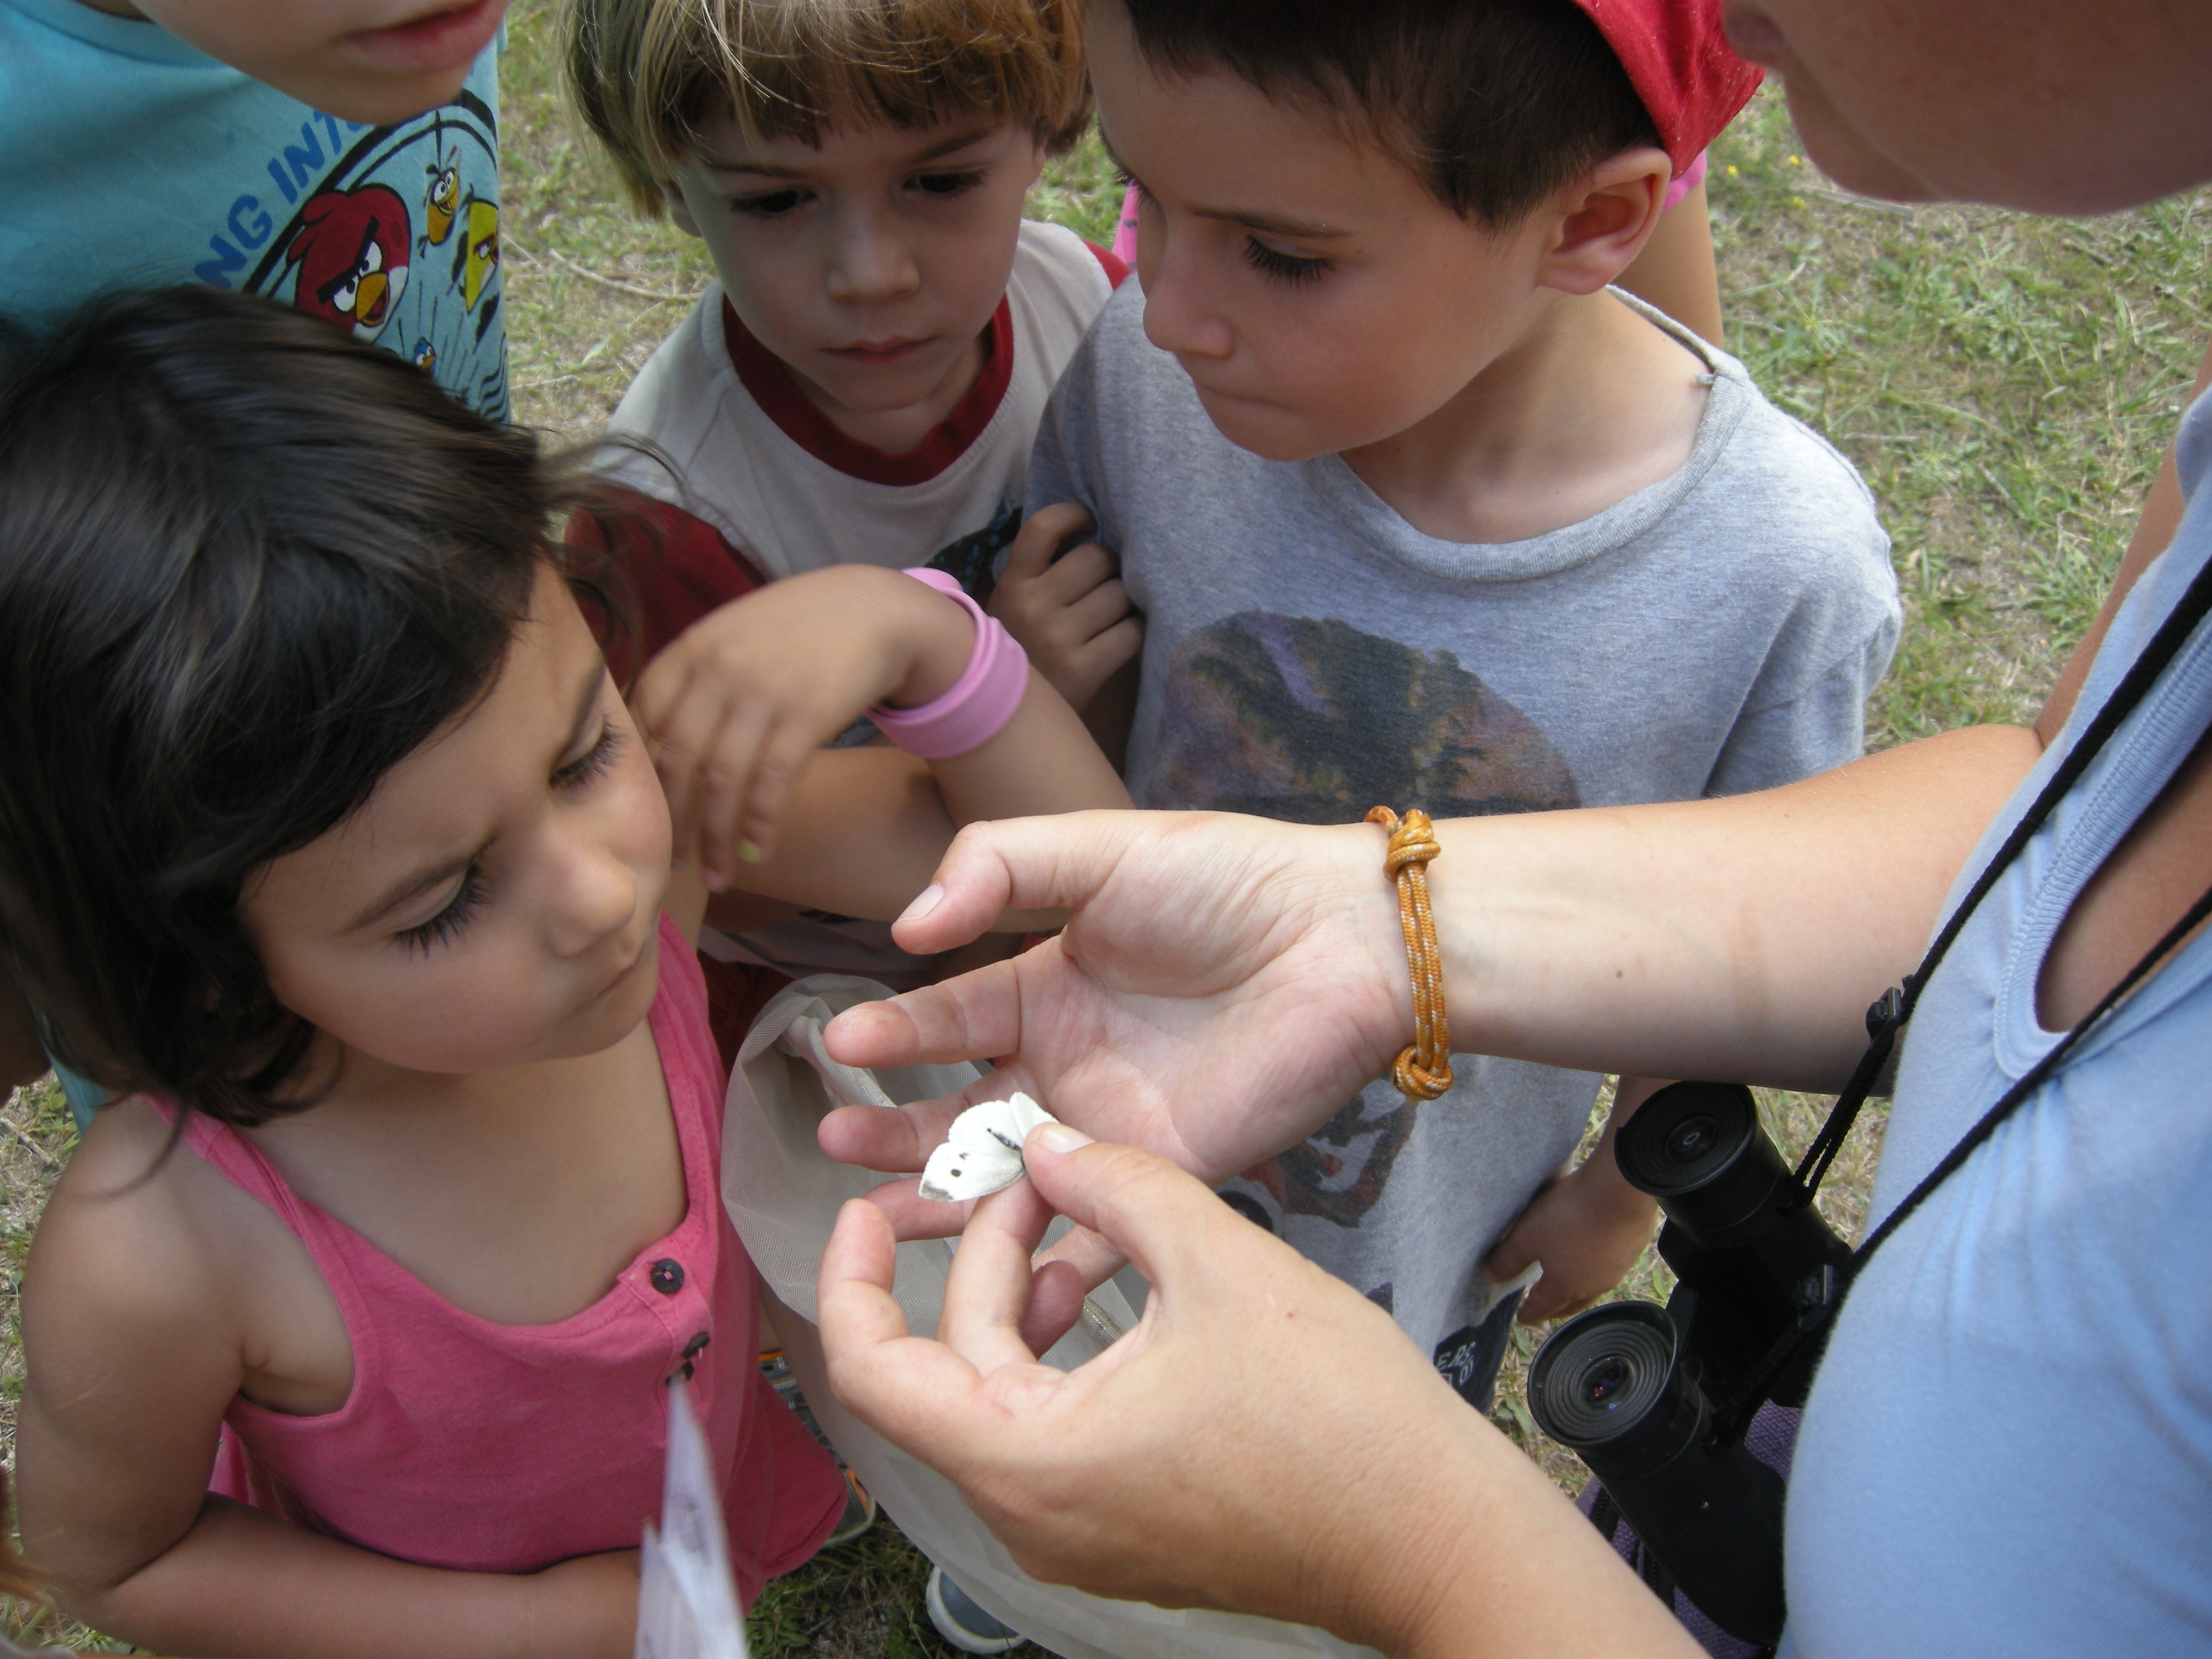 Visita guiada: Les papallones al parc